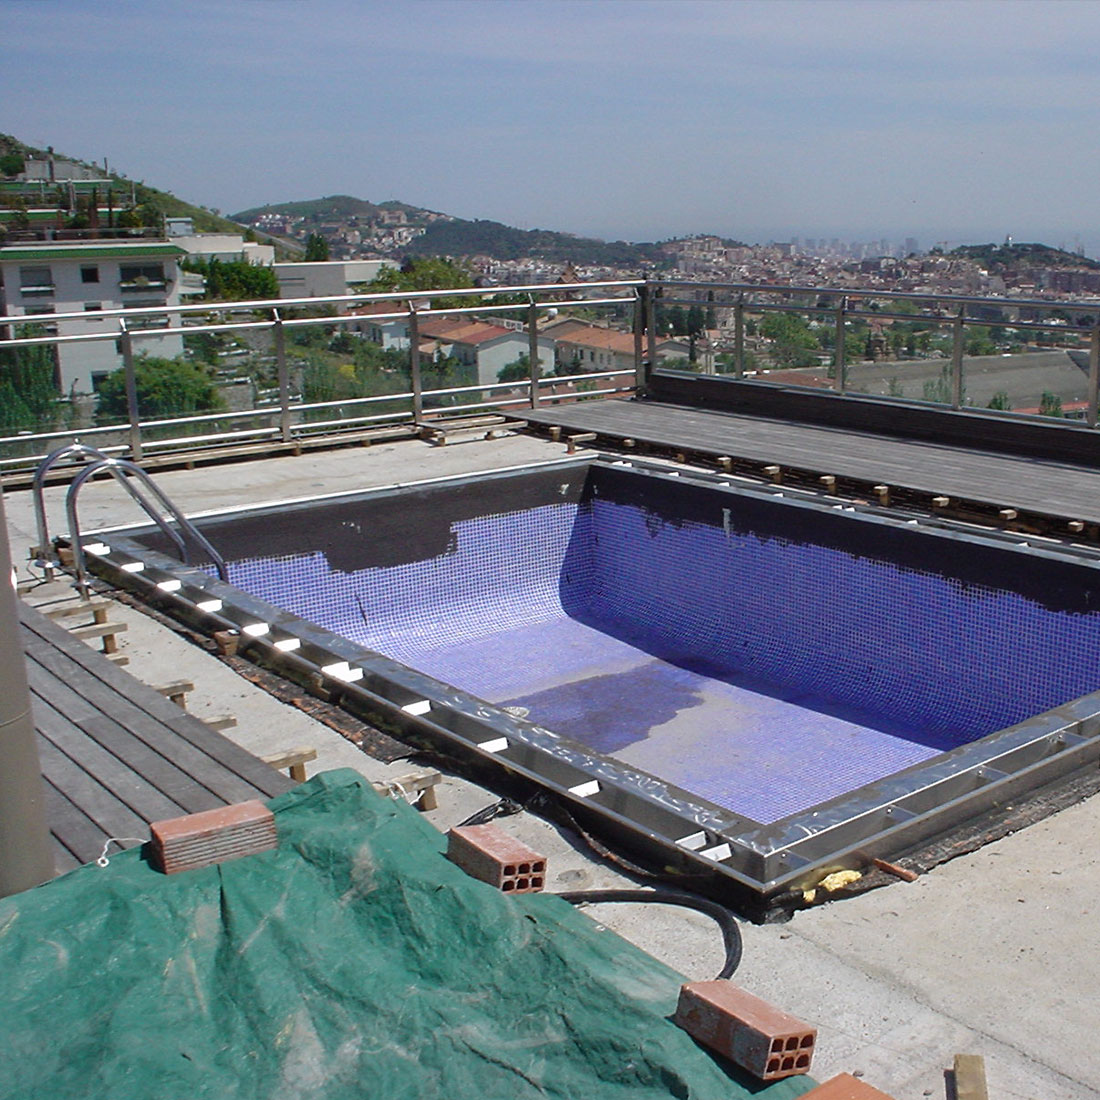 arquitectura y diseño de interiores integrales,-fugrup-particular-metal-piscina_01